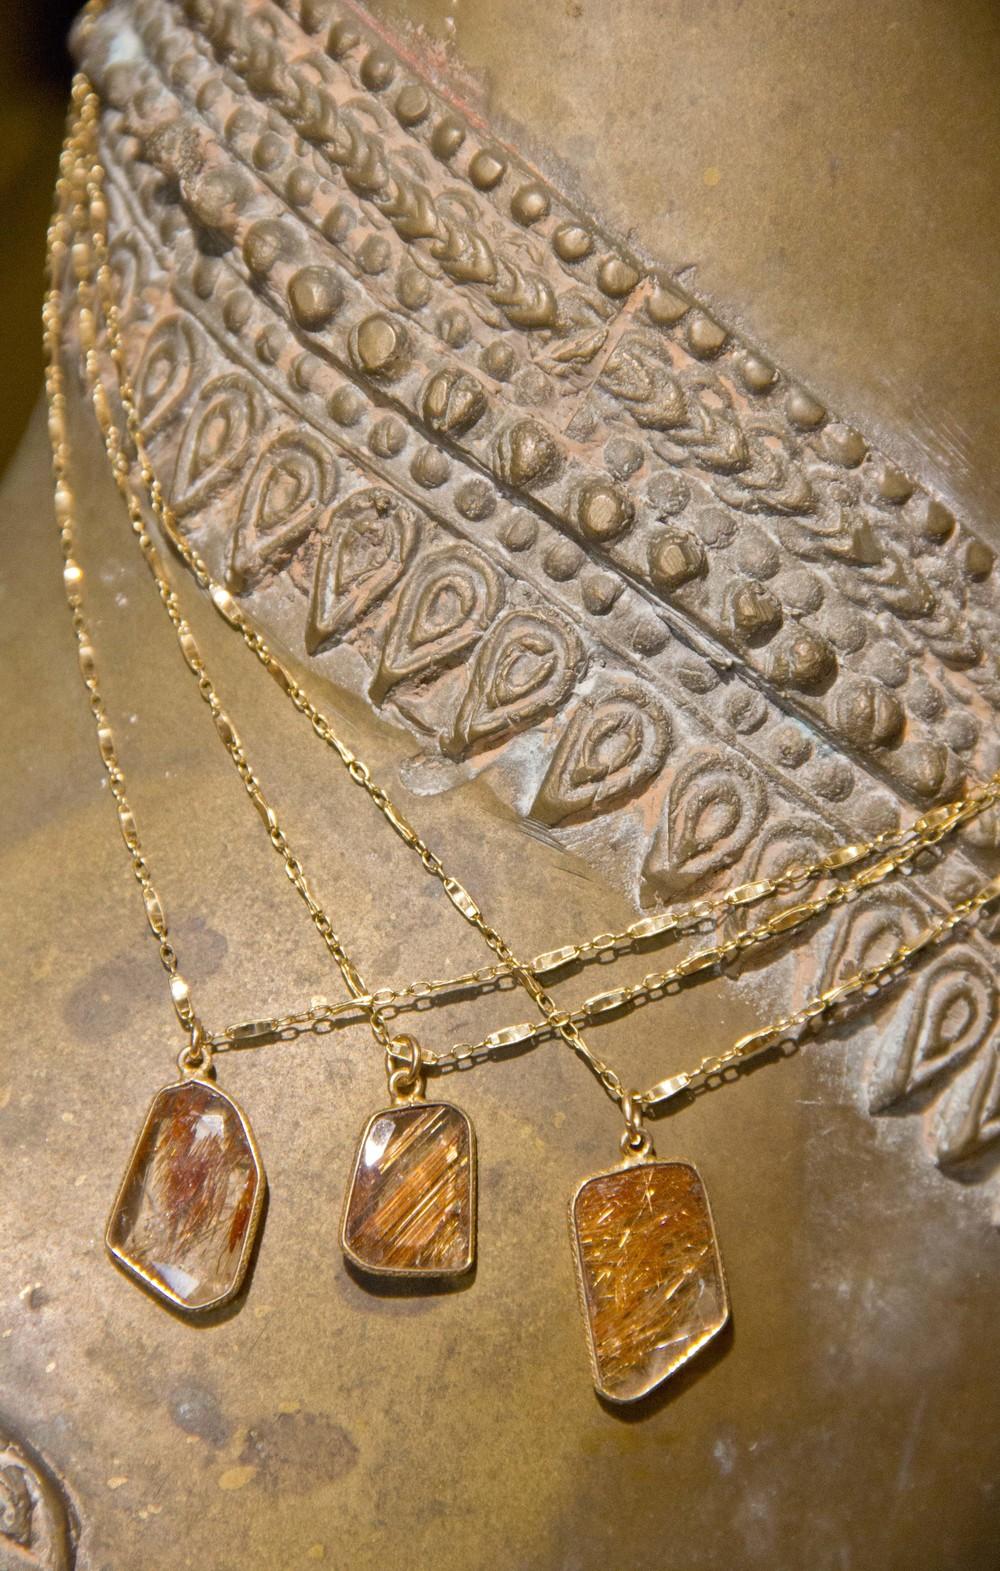 Rutilated Quartz Geometric Pendants GF Vintage Inspired Chain Group Shots Necklaces_01.jpg